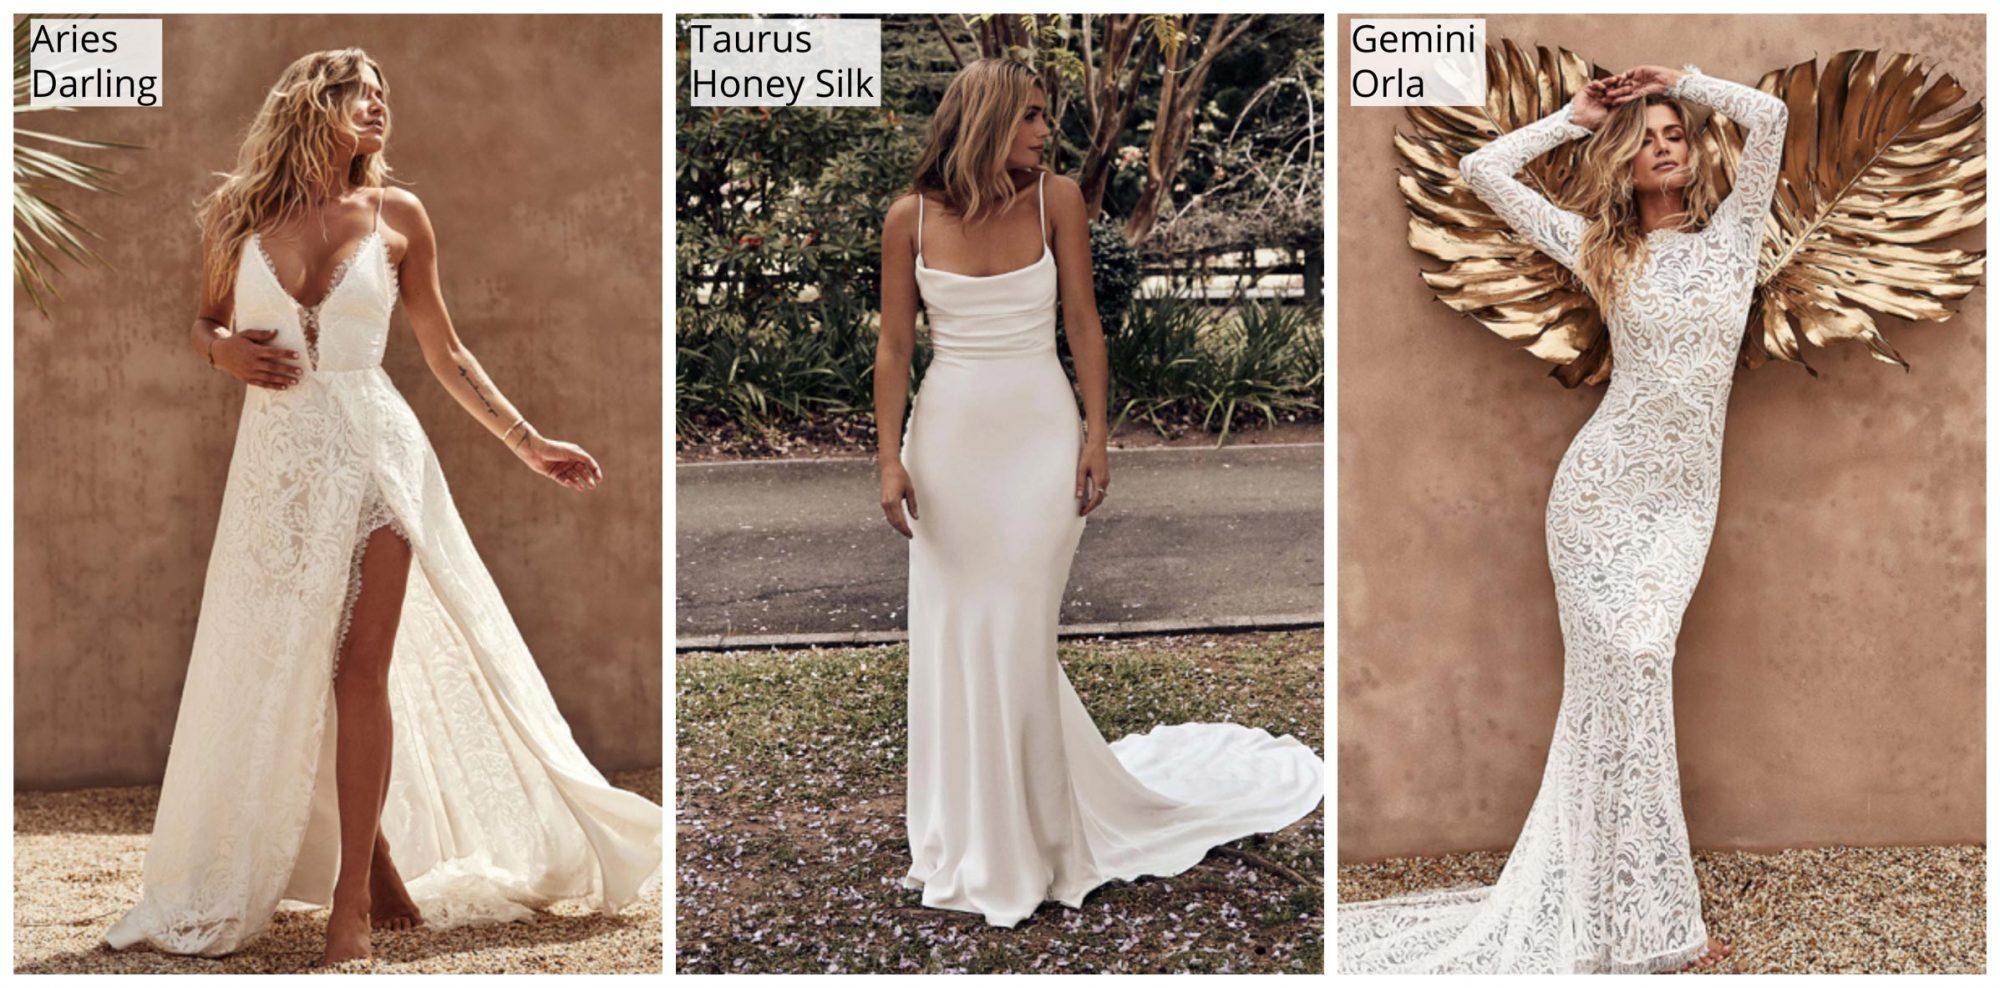 Dress for your zodiac: Aries Taurus Gemini